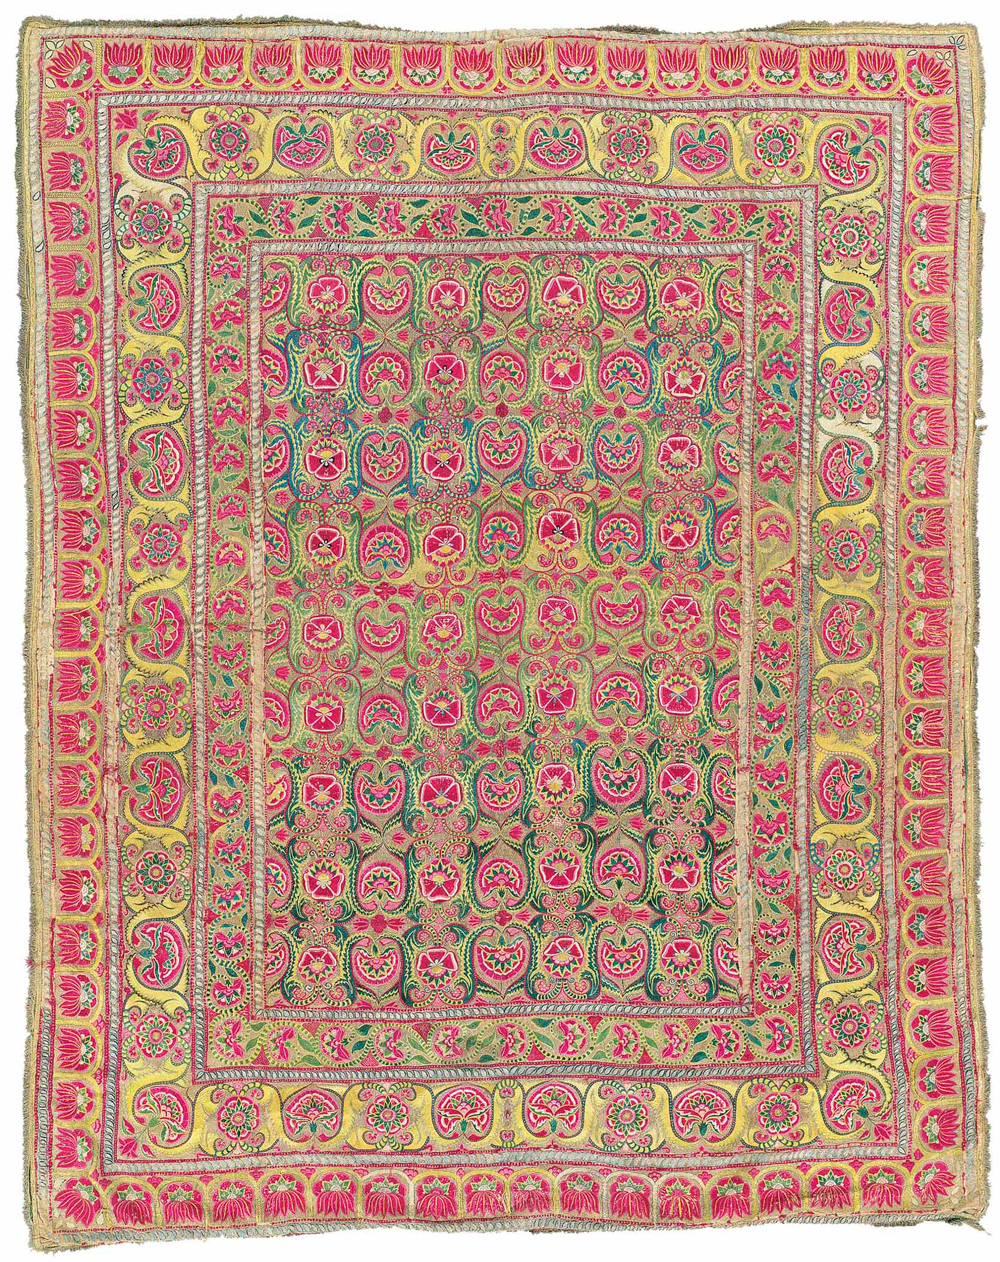 Deccan embroidery